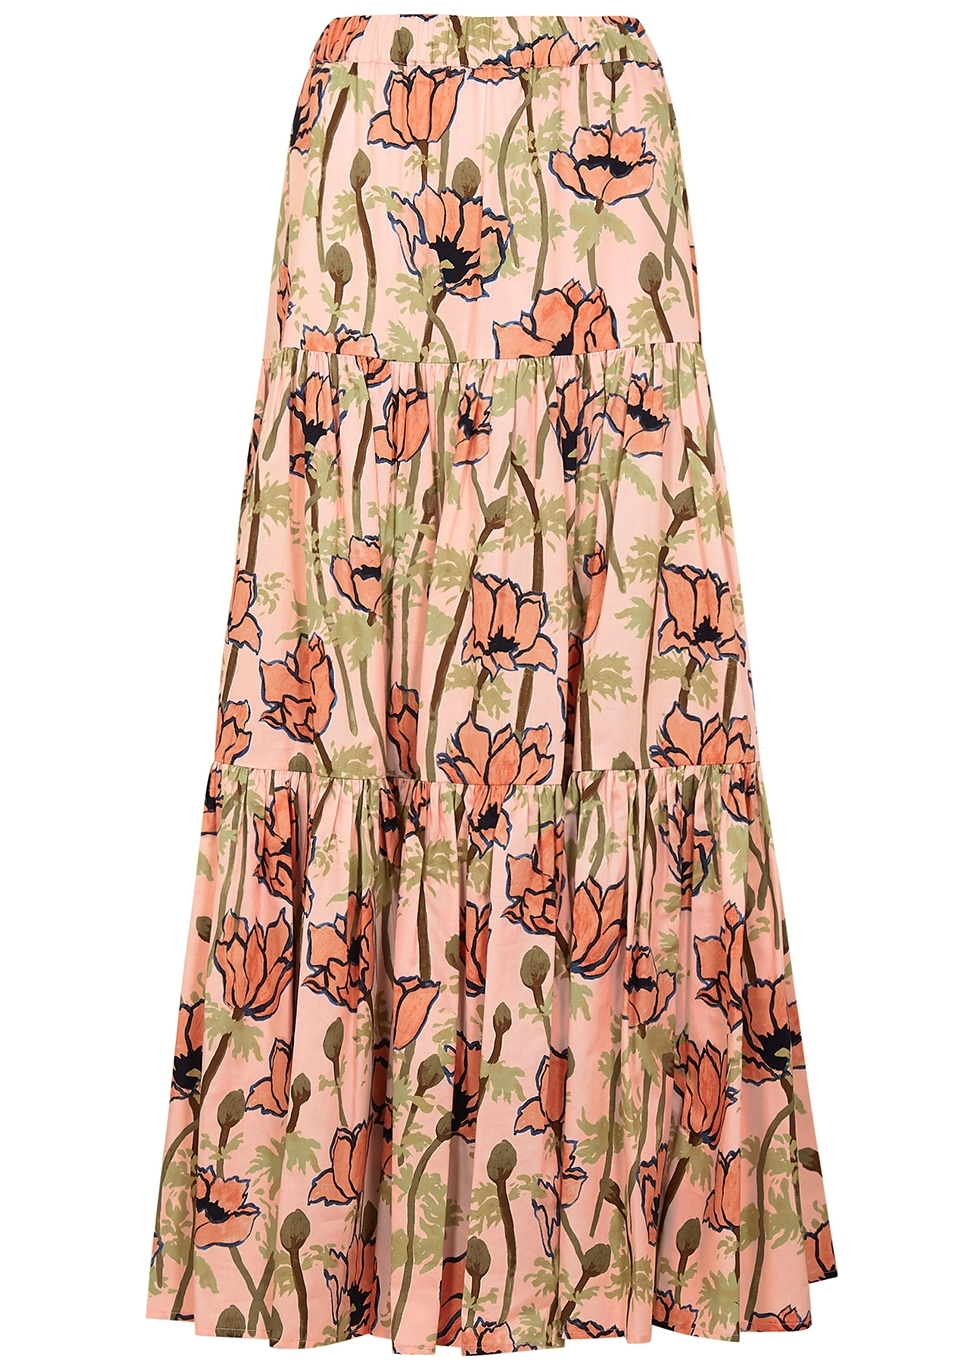 0dbcc5017b Women's Designer Skirts - Harvey Nichols